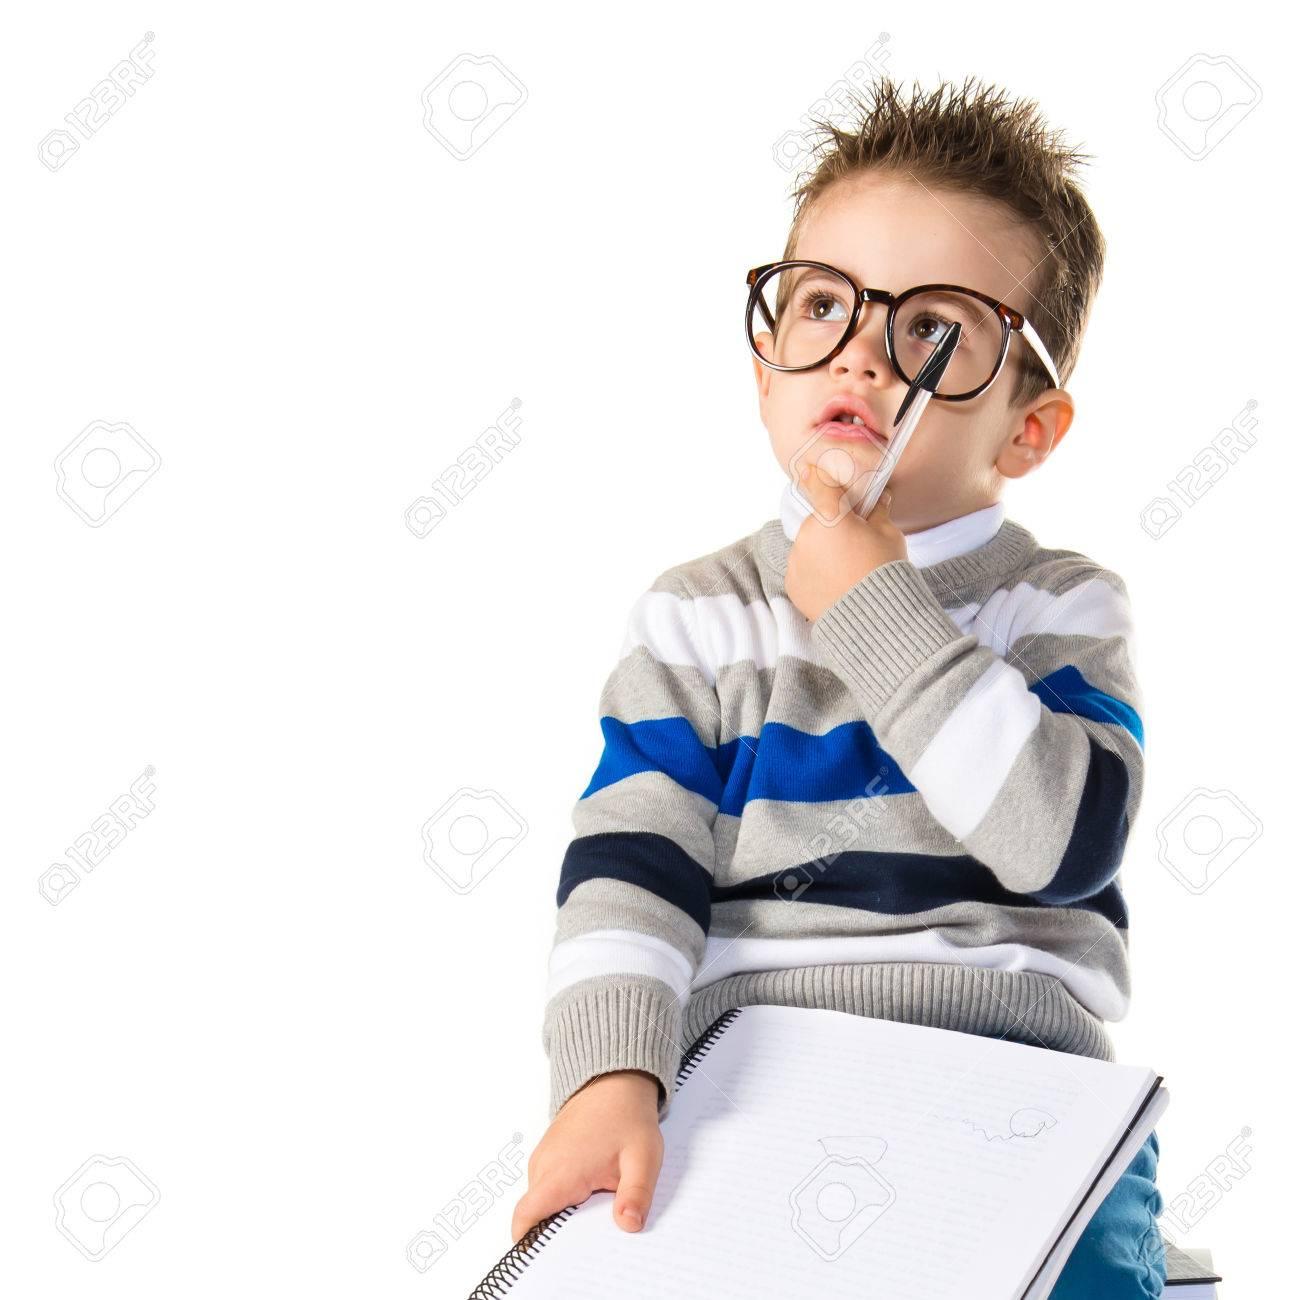 Kid thinking on books Stock Photo - 37614142